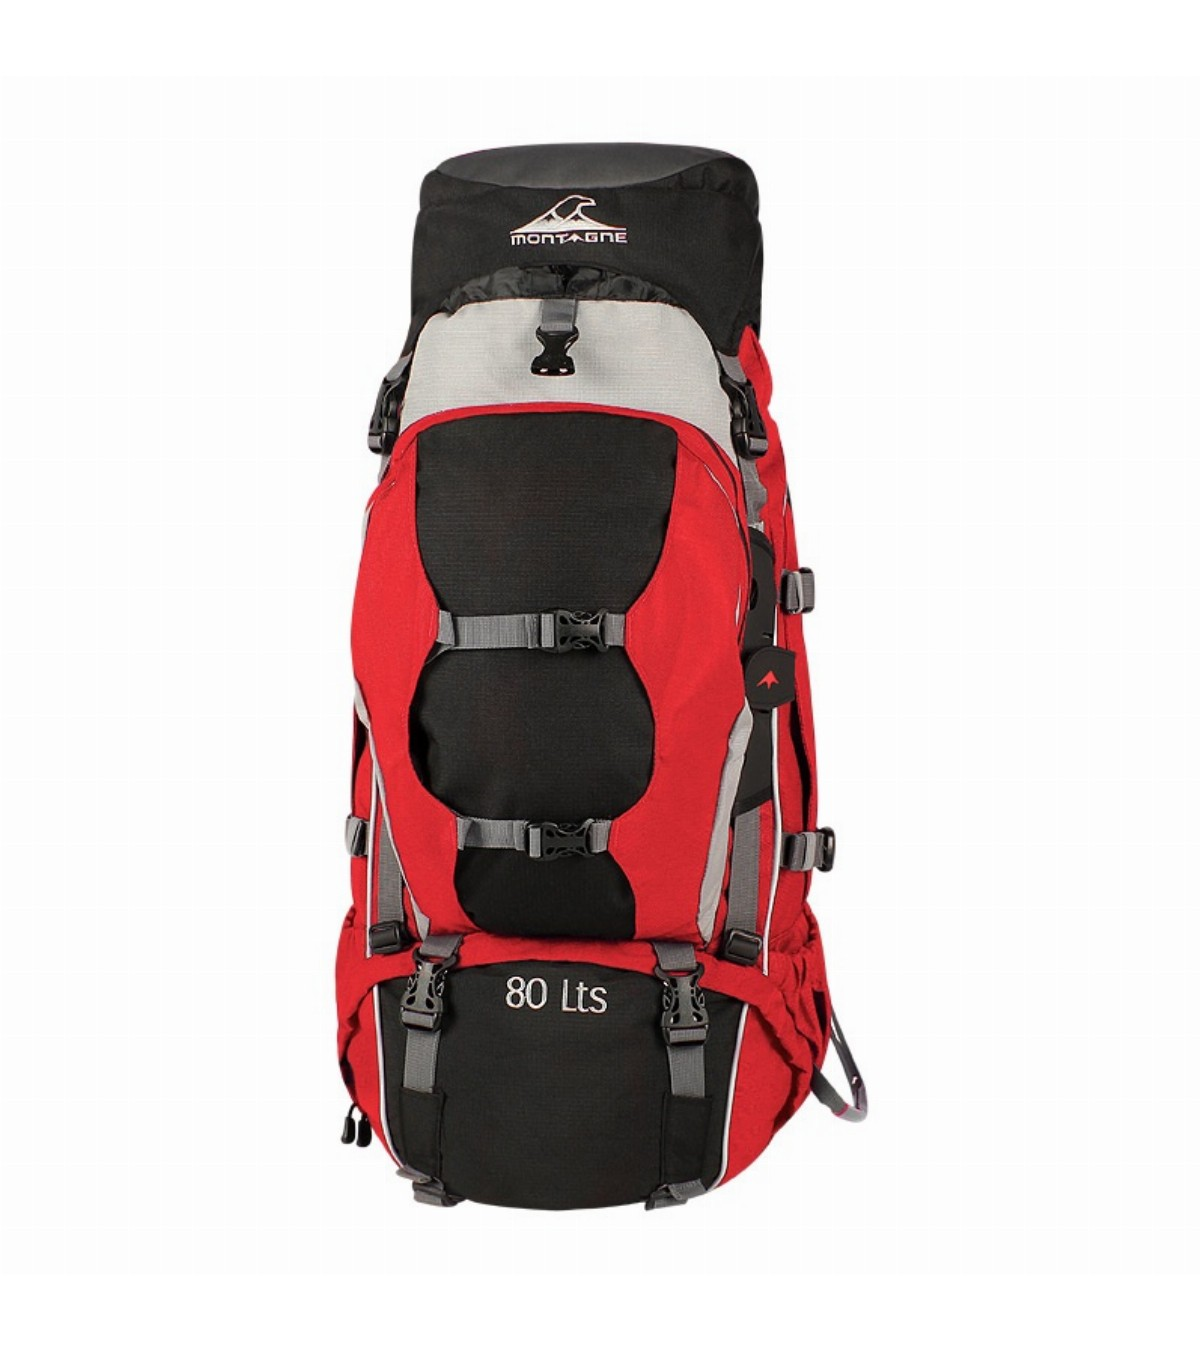 bc9108180 Montagne: mochila, mochilas, montanismo, camping, mochila grande, mochila  camping, mochilero, mochilas anatomicas, porta bastones, mochila de  mochilero, ...